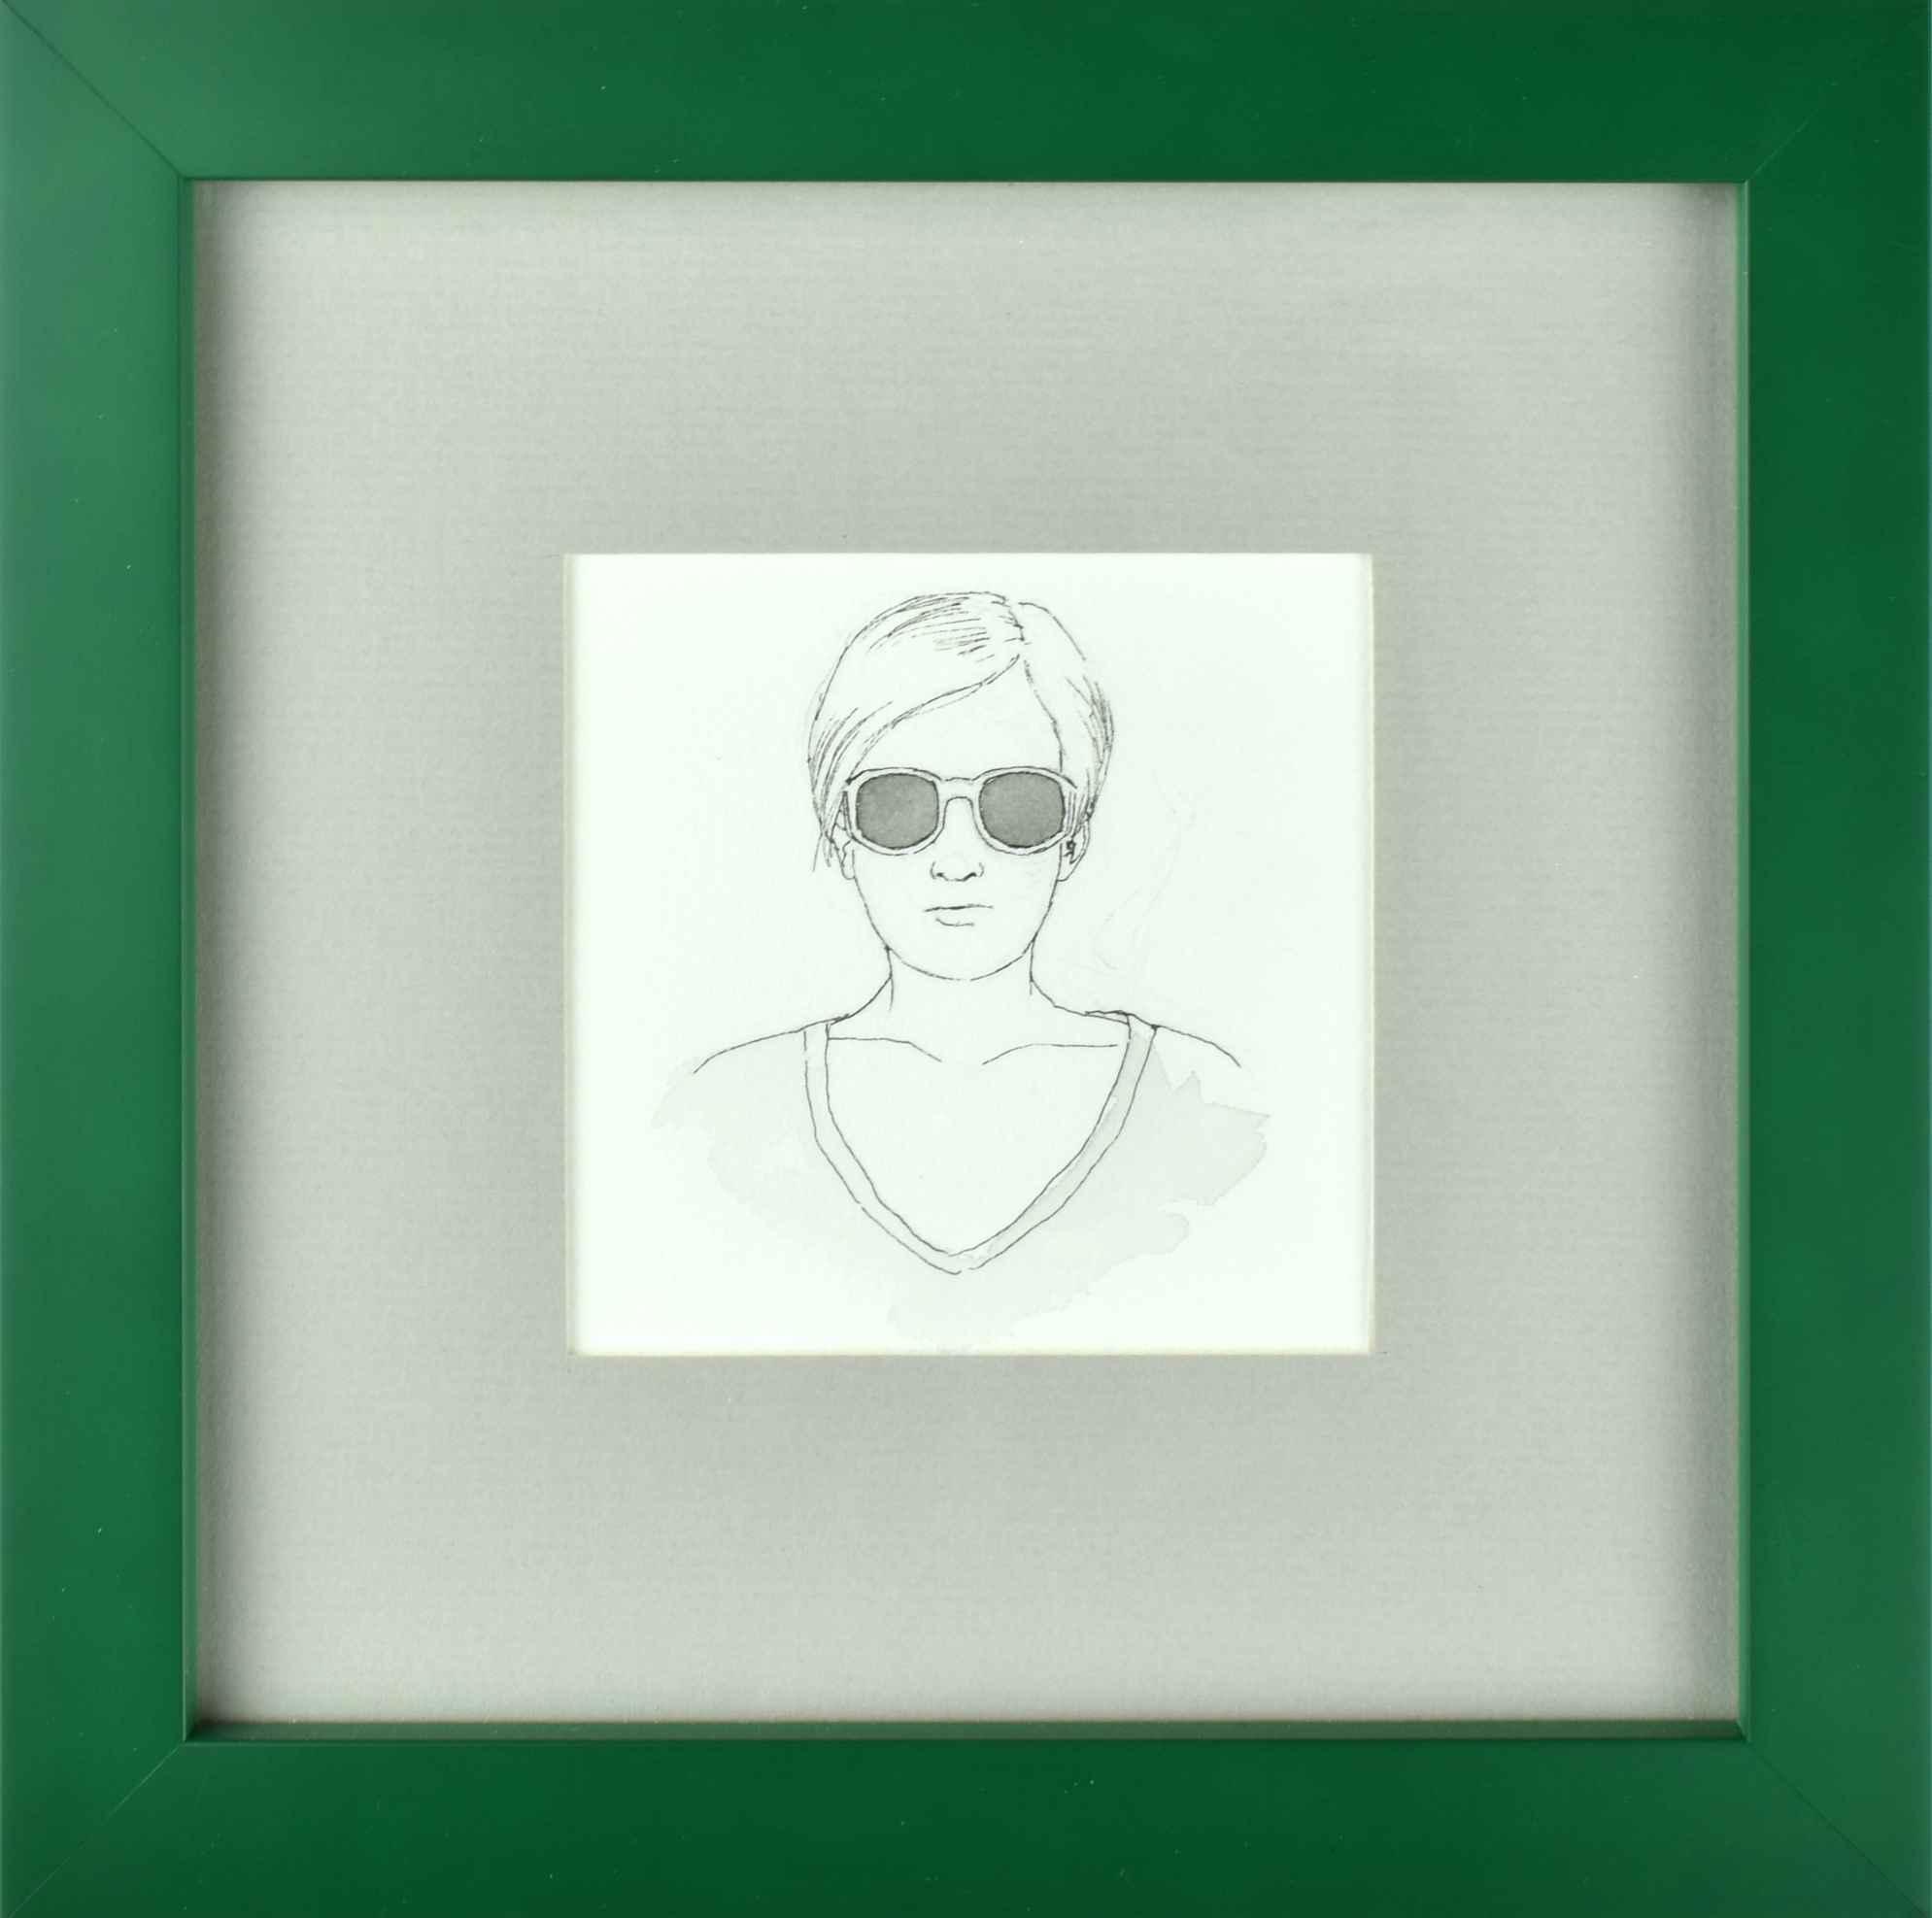 Sunglasses 5 by  Jill Hakala - Masterpiece Online